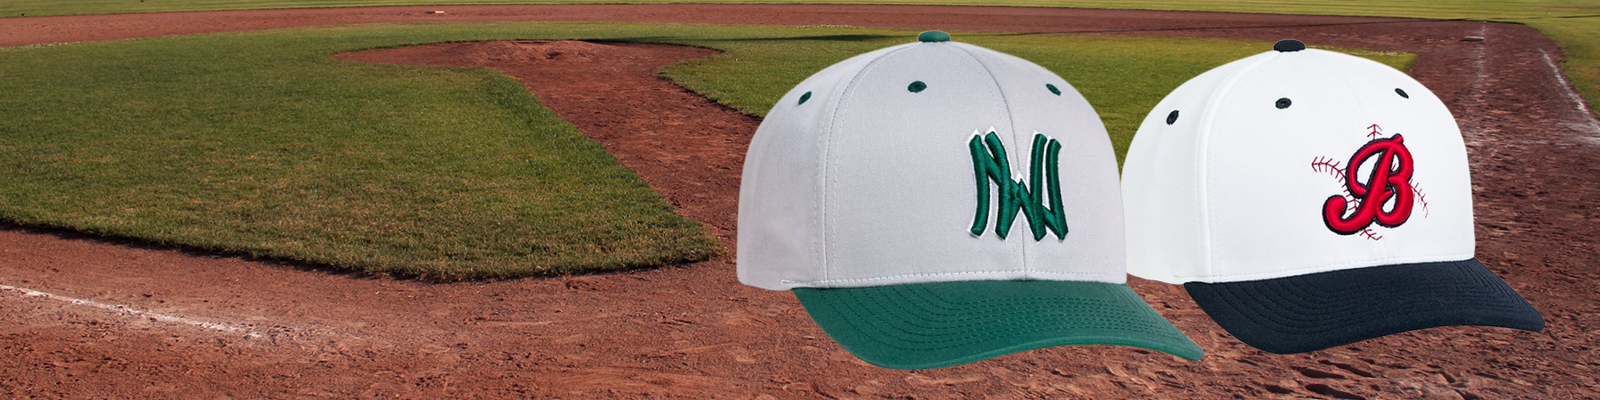 Custom Team Baseball Hats